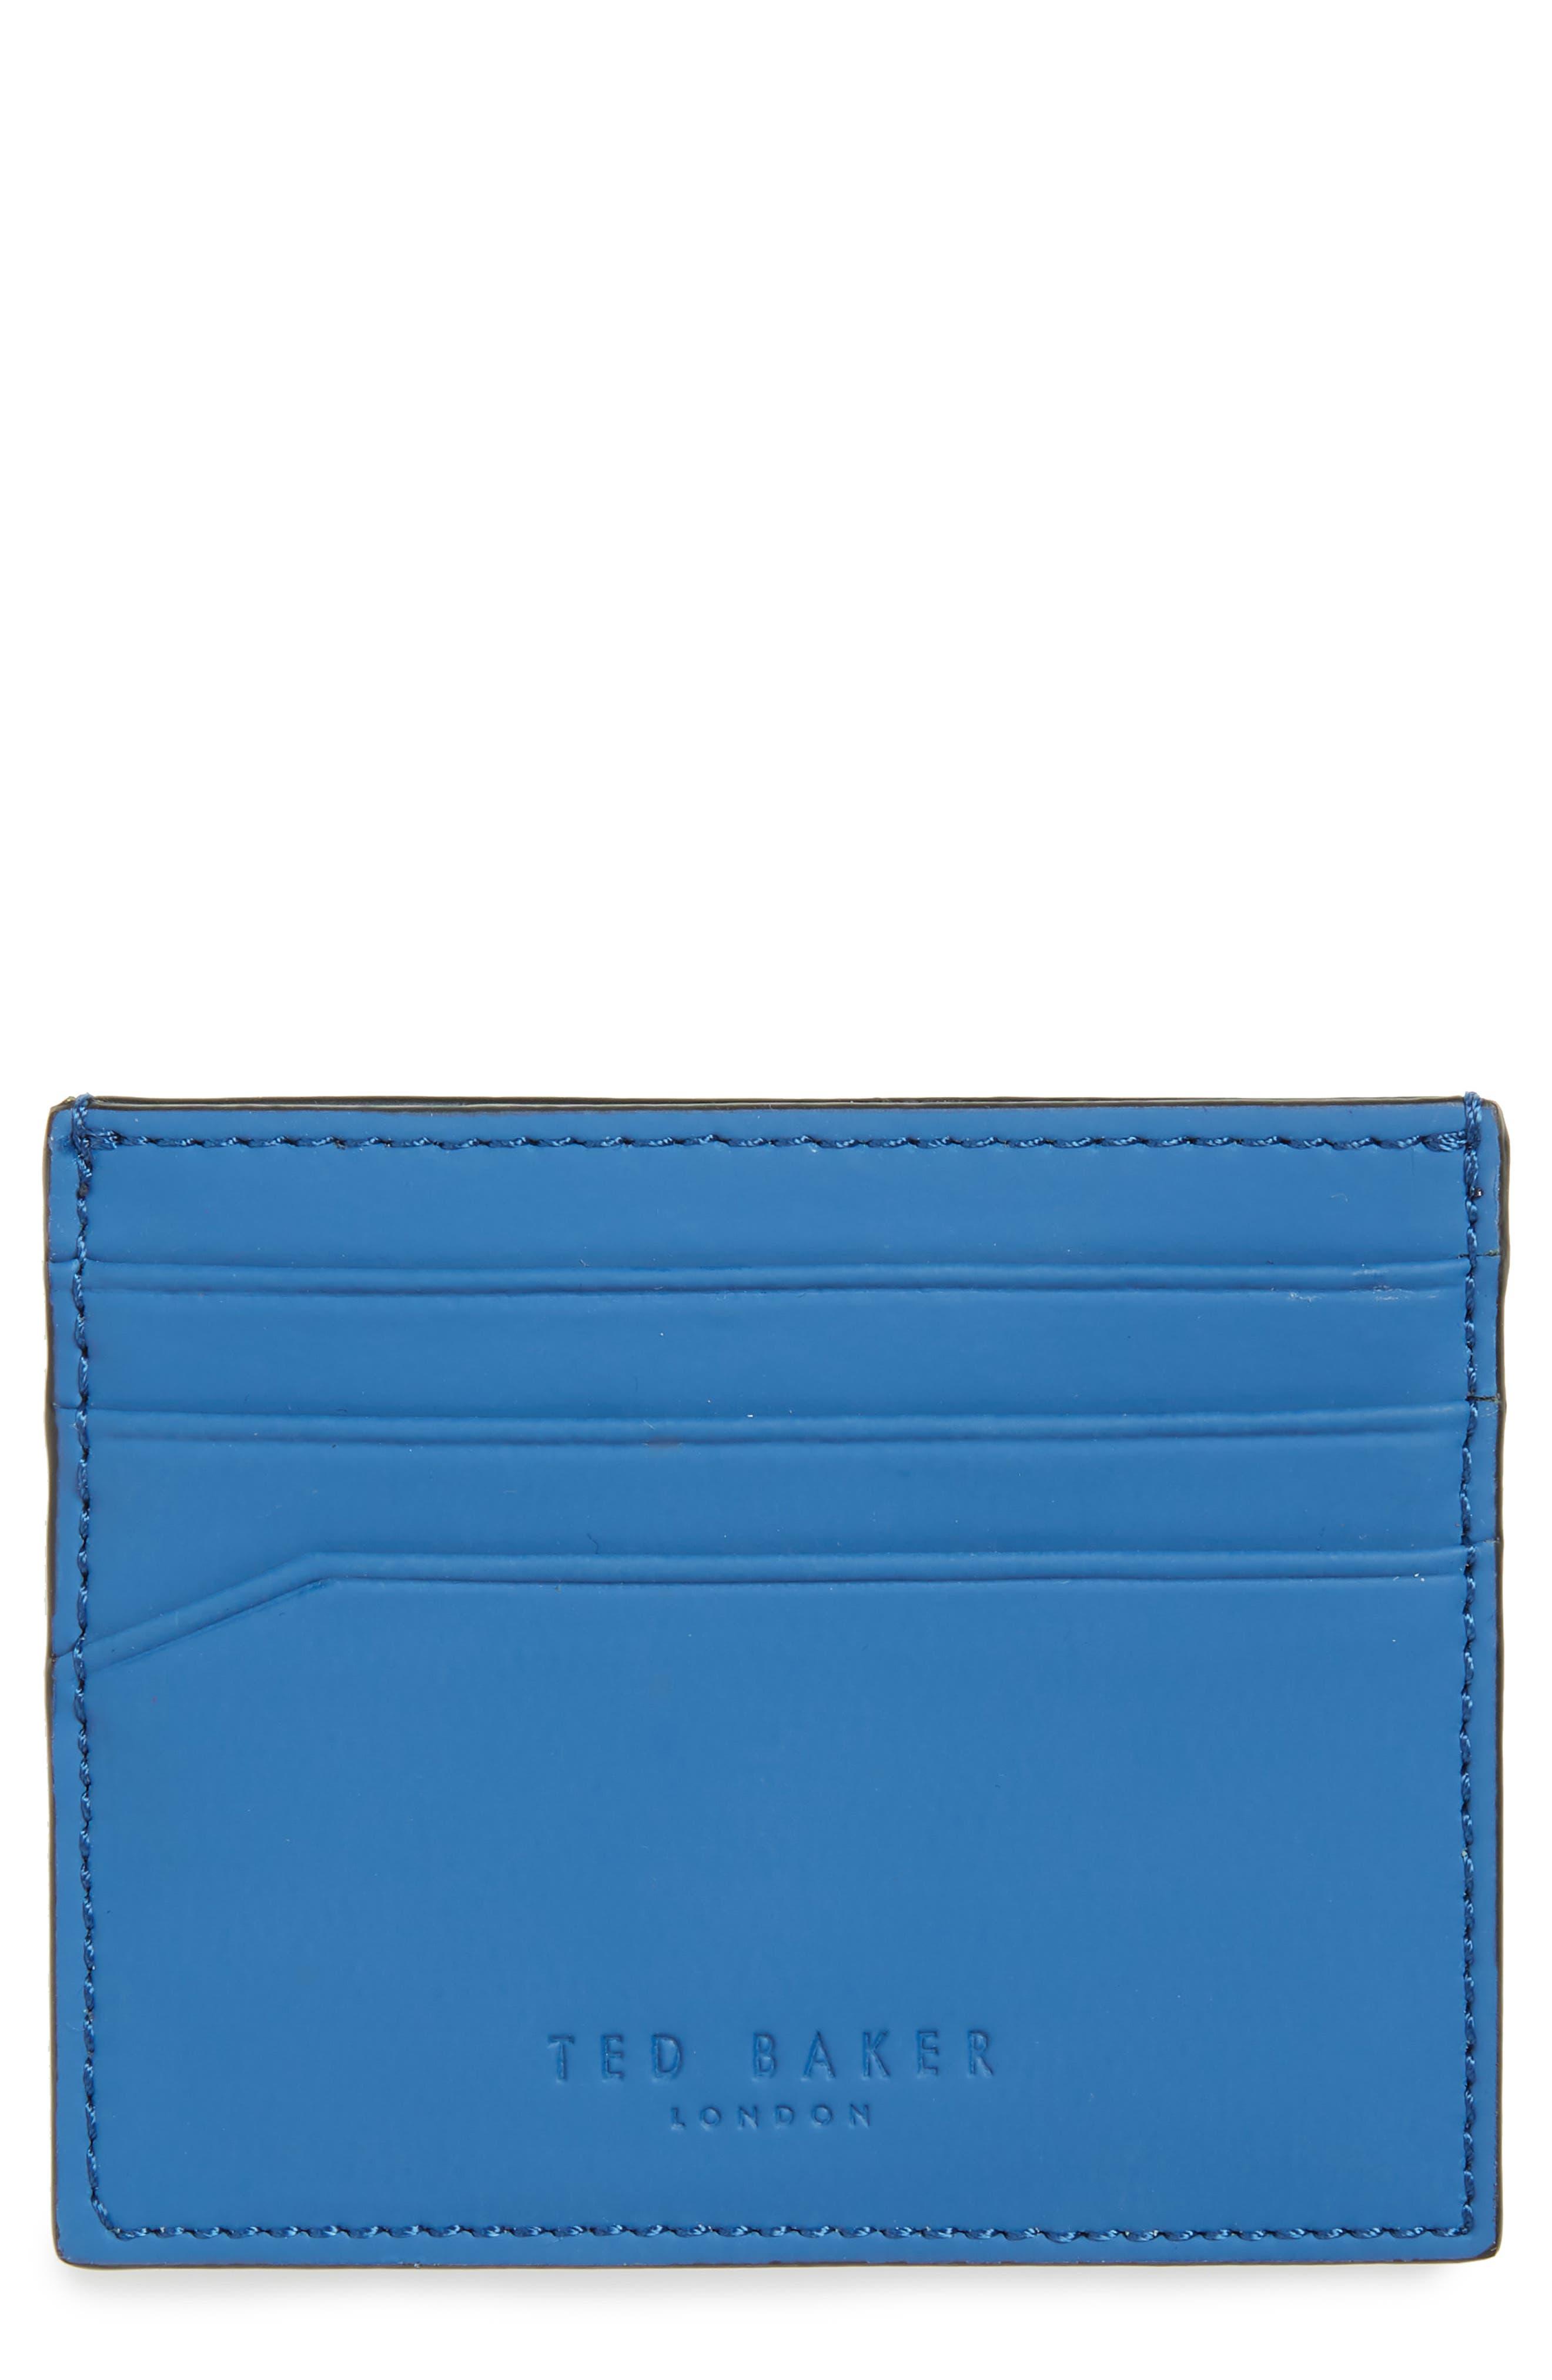 Sands Rubber Leather Card Case,                             Main thumbnail 1, color,                             Blue